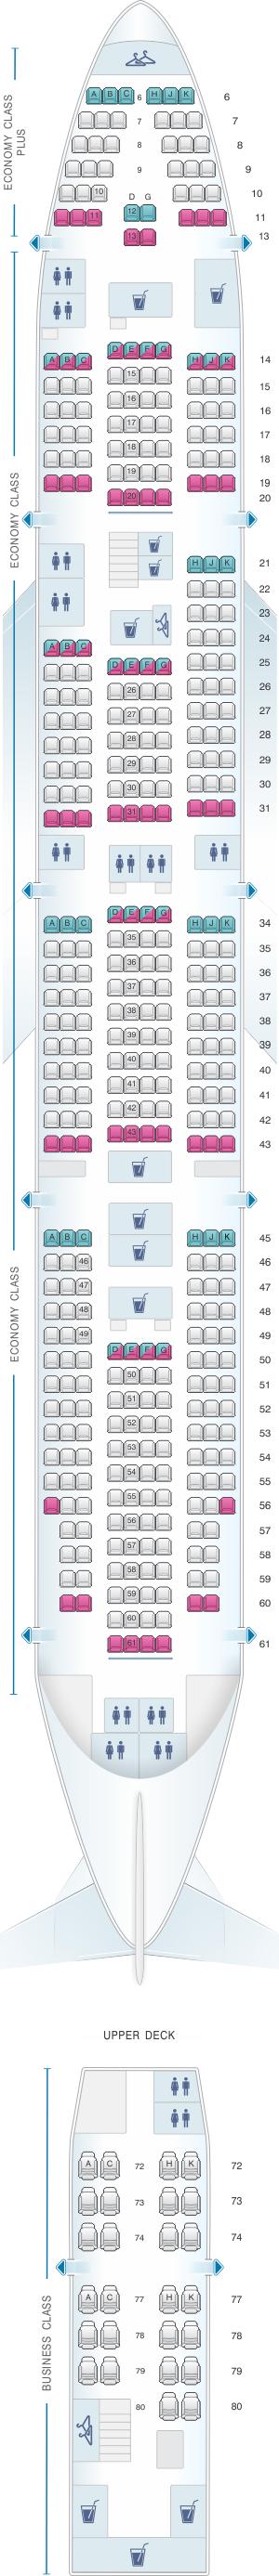 Seat map for El Al Israel Airlines Boeing B747 400 455pax